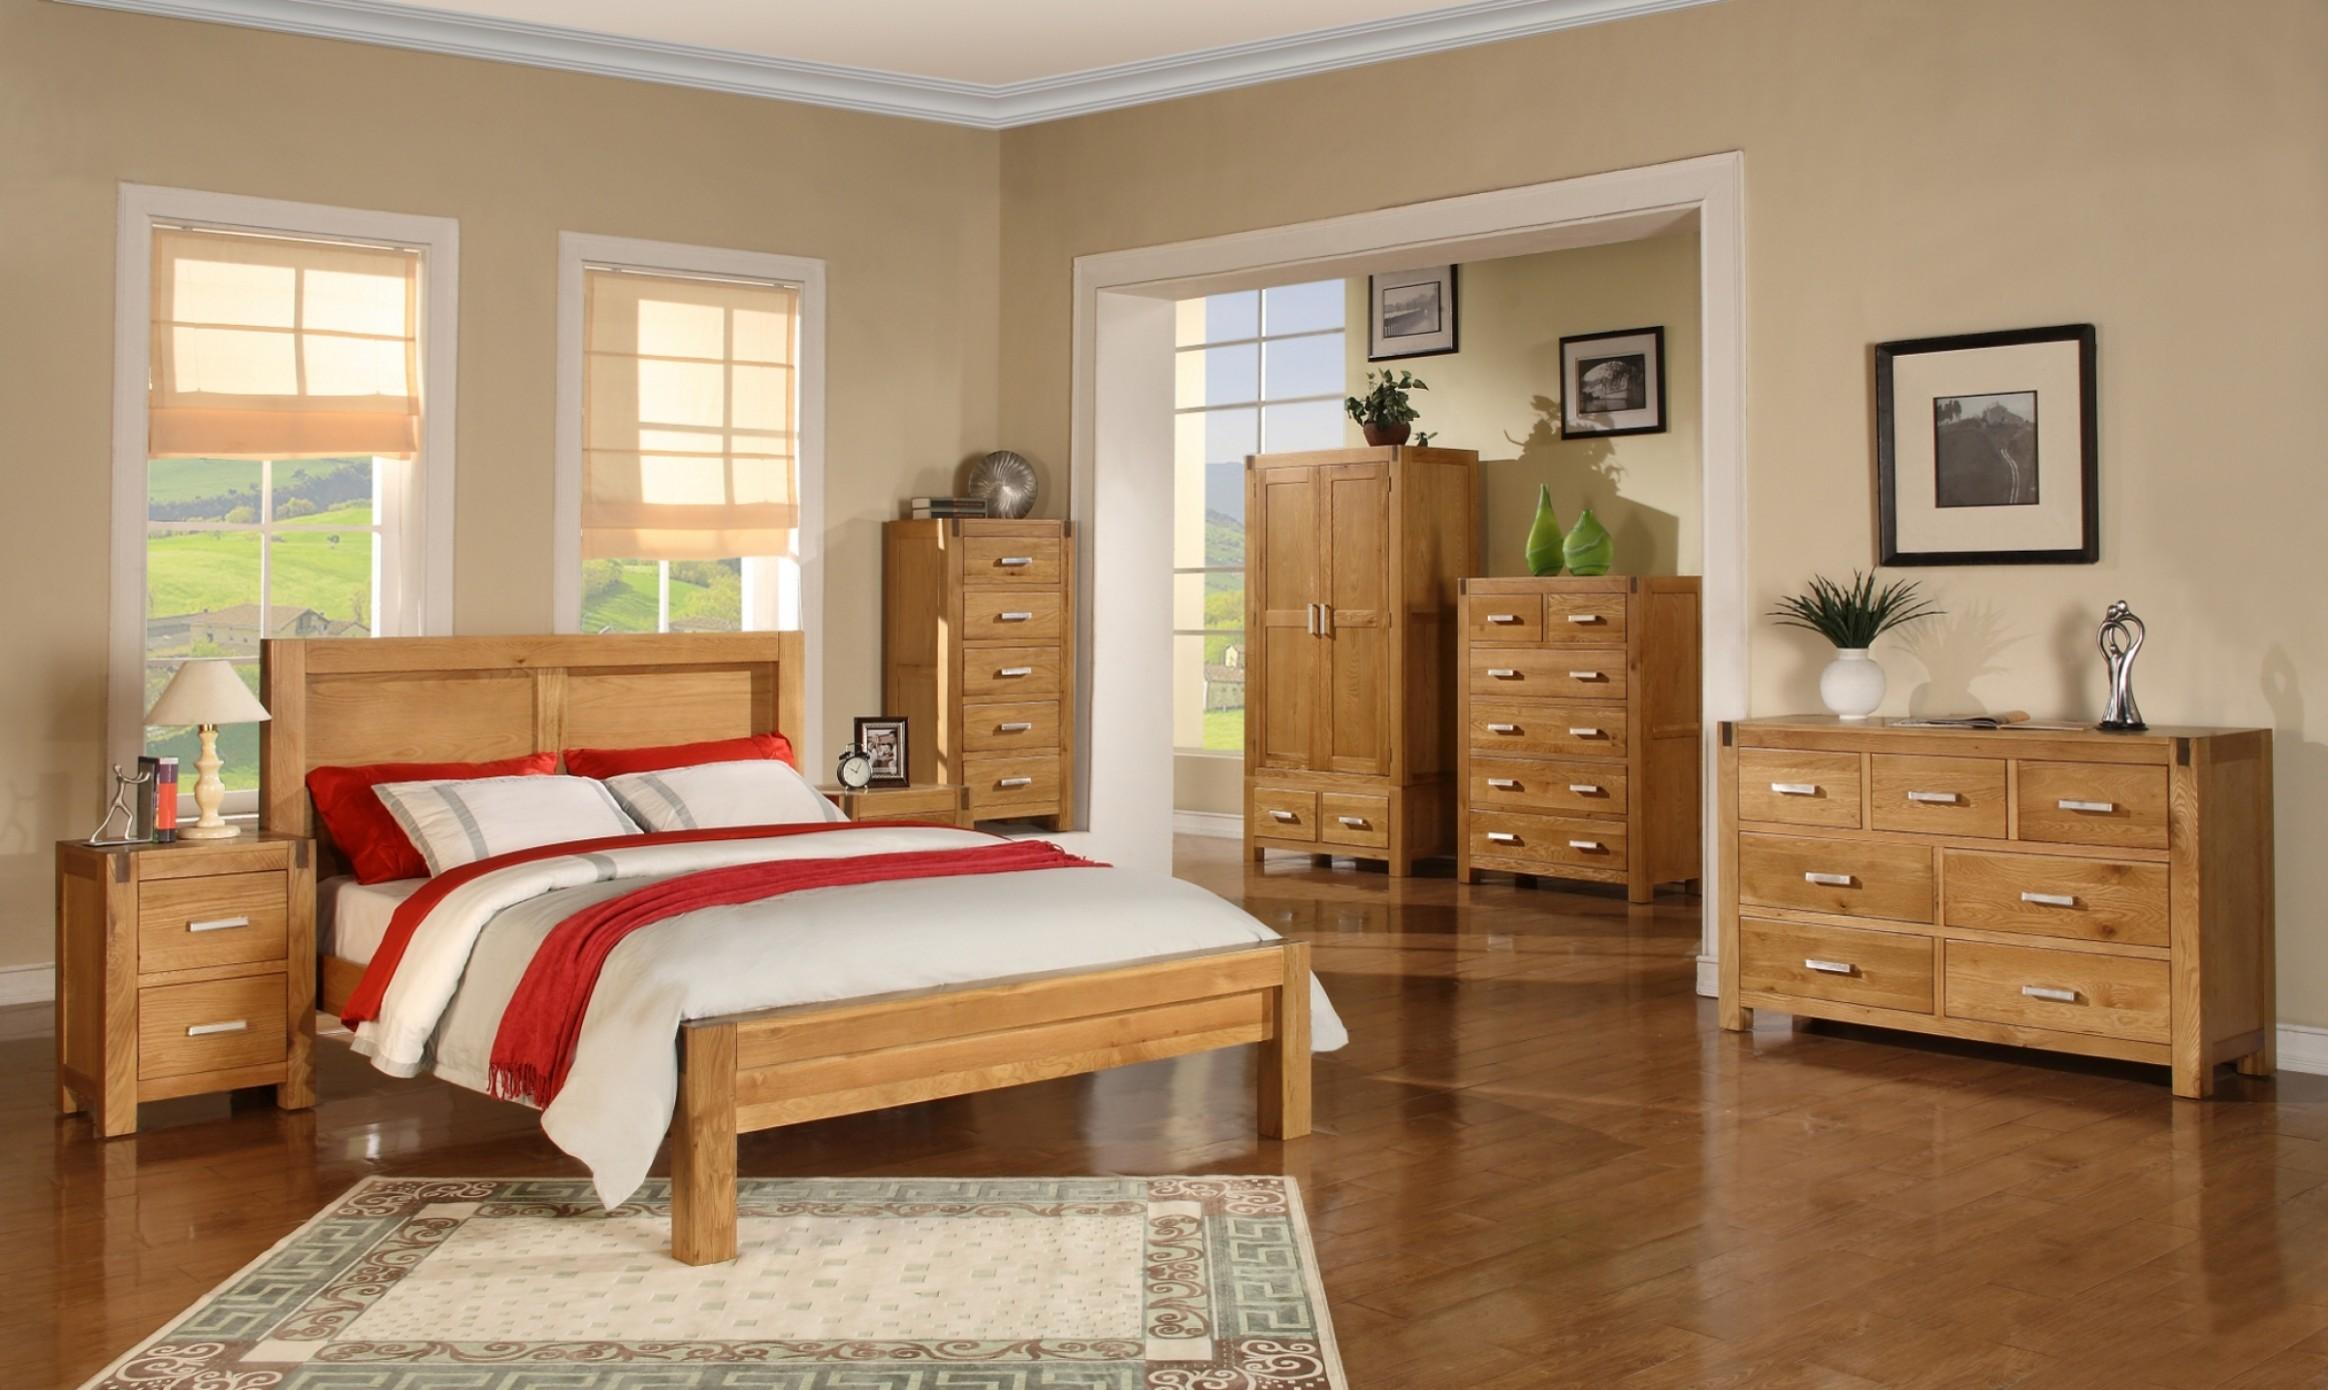 Oak Bedroom Furniture Sets - Ideas on Foter - Bedroom Ideas Oak Furniture